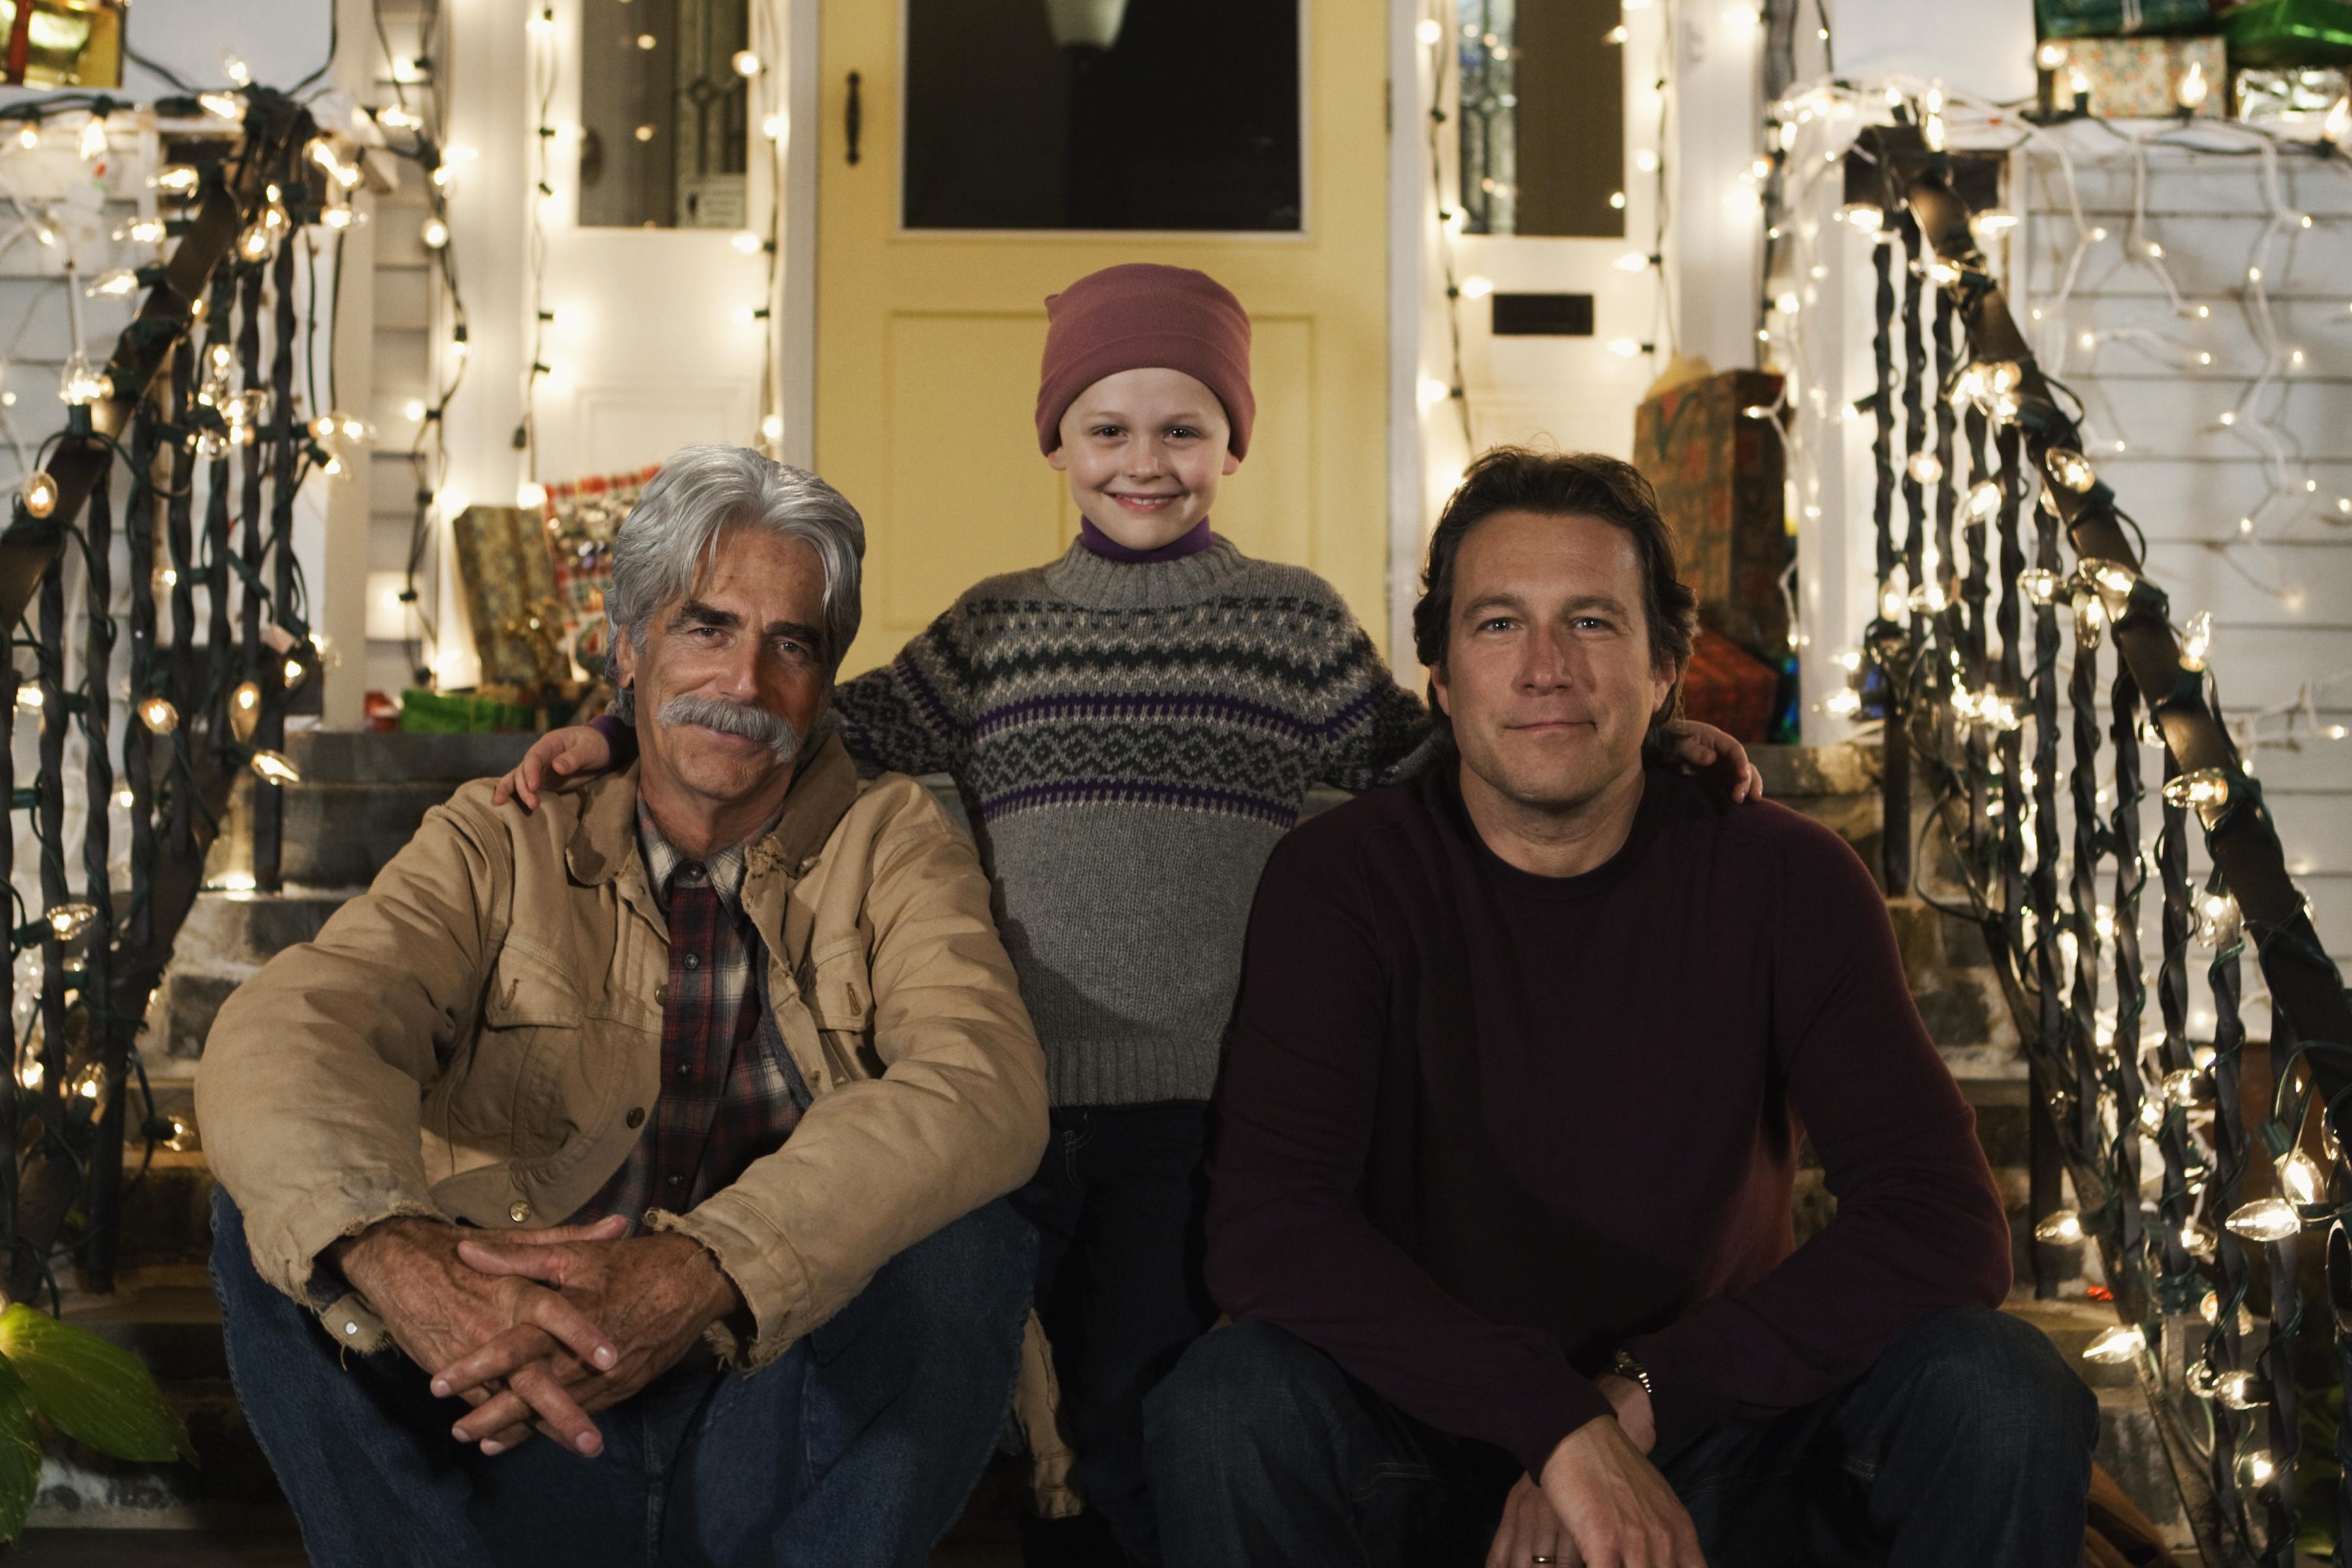 November Christmas | Hallmark Movies and Mysteries